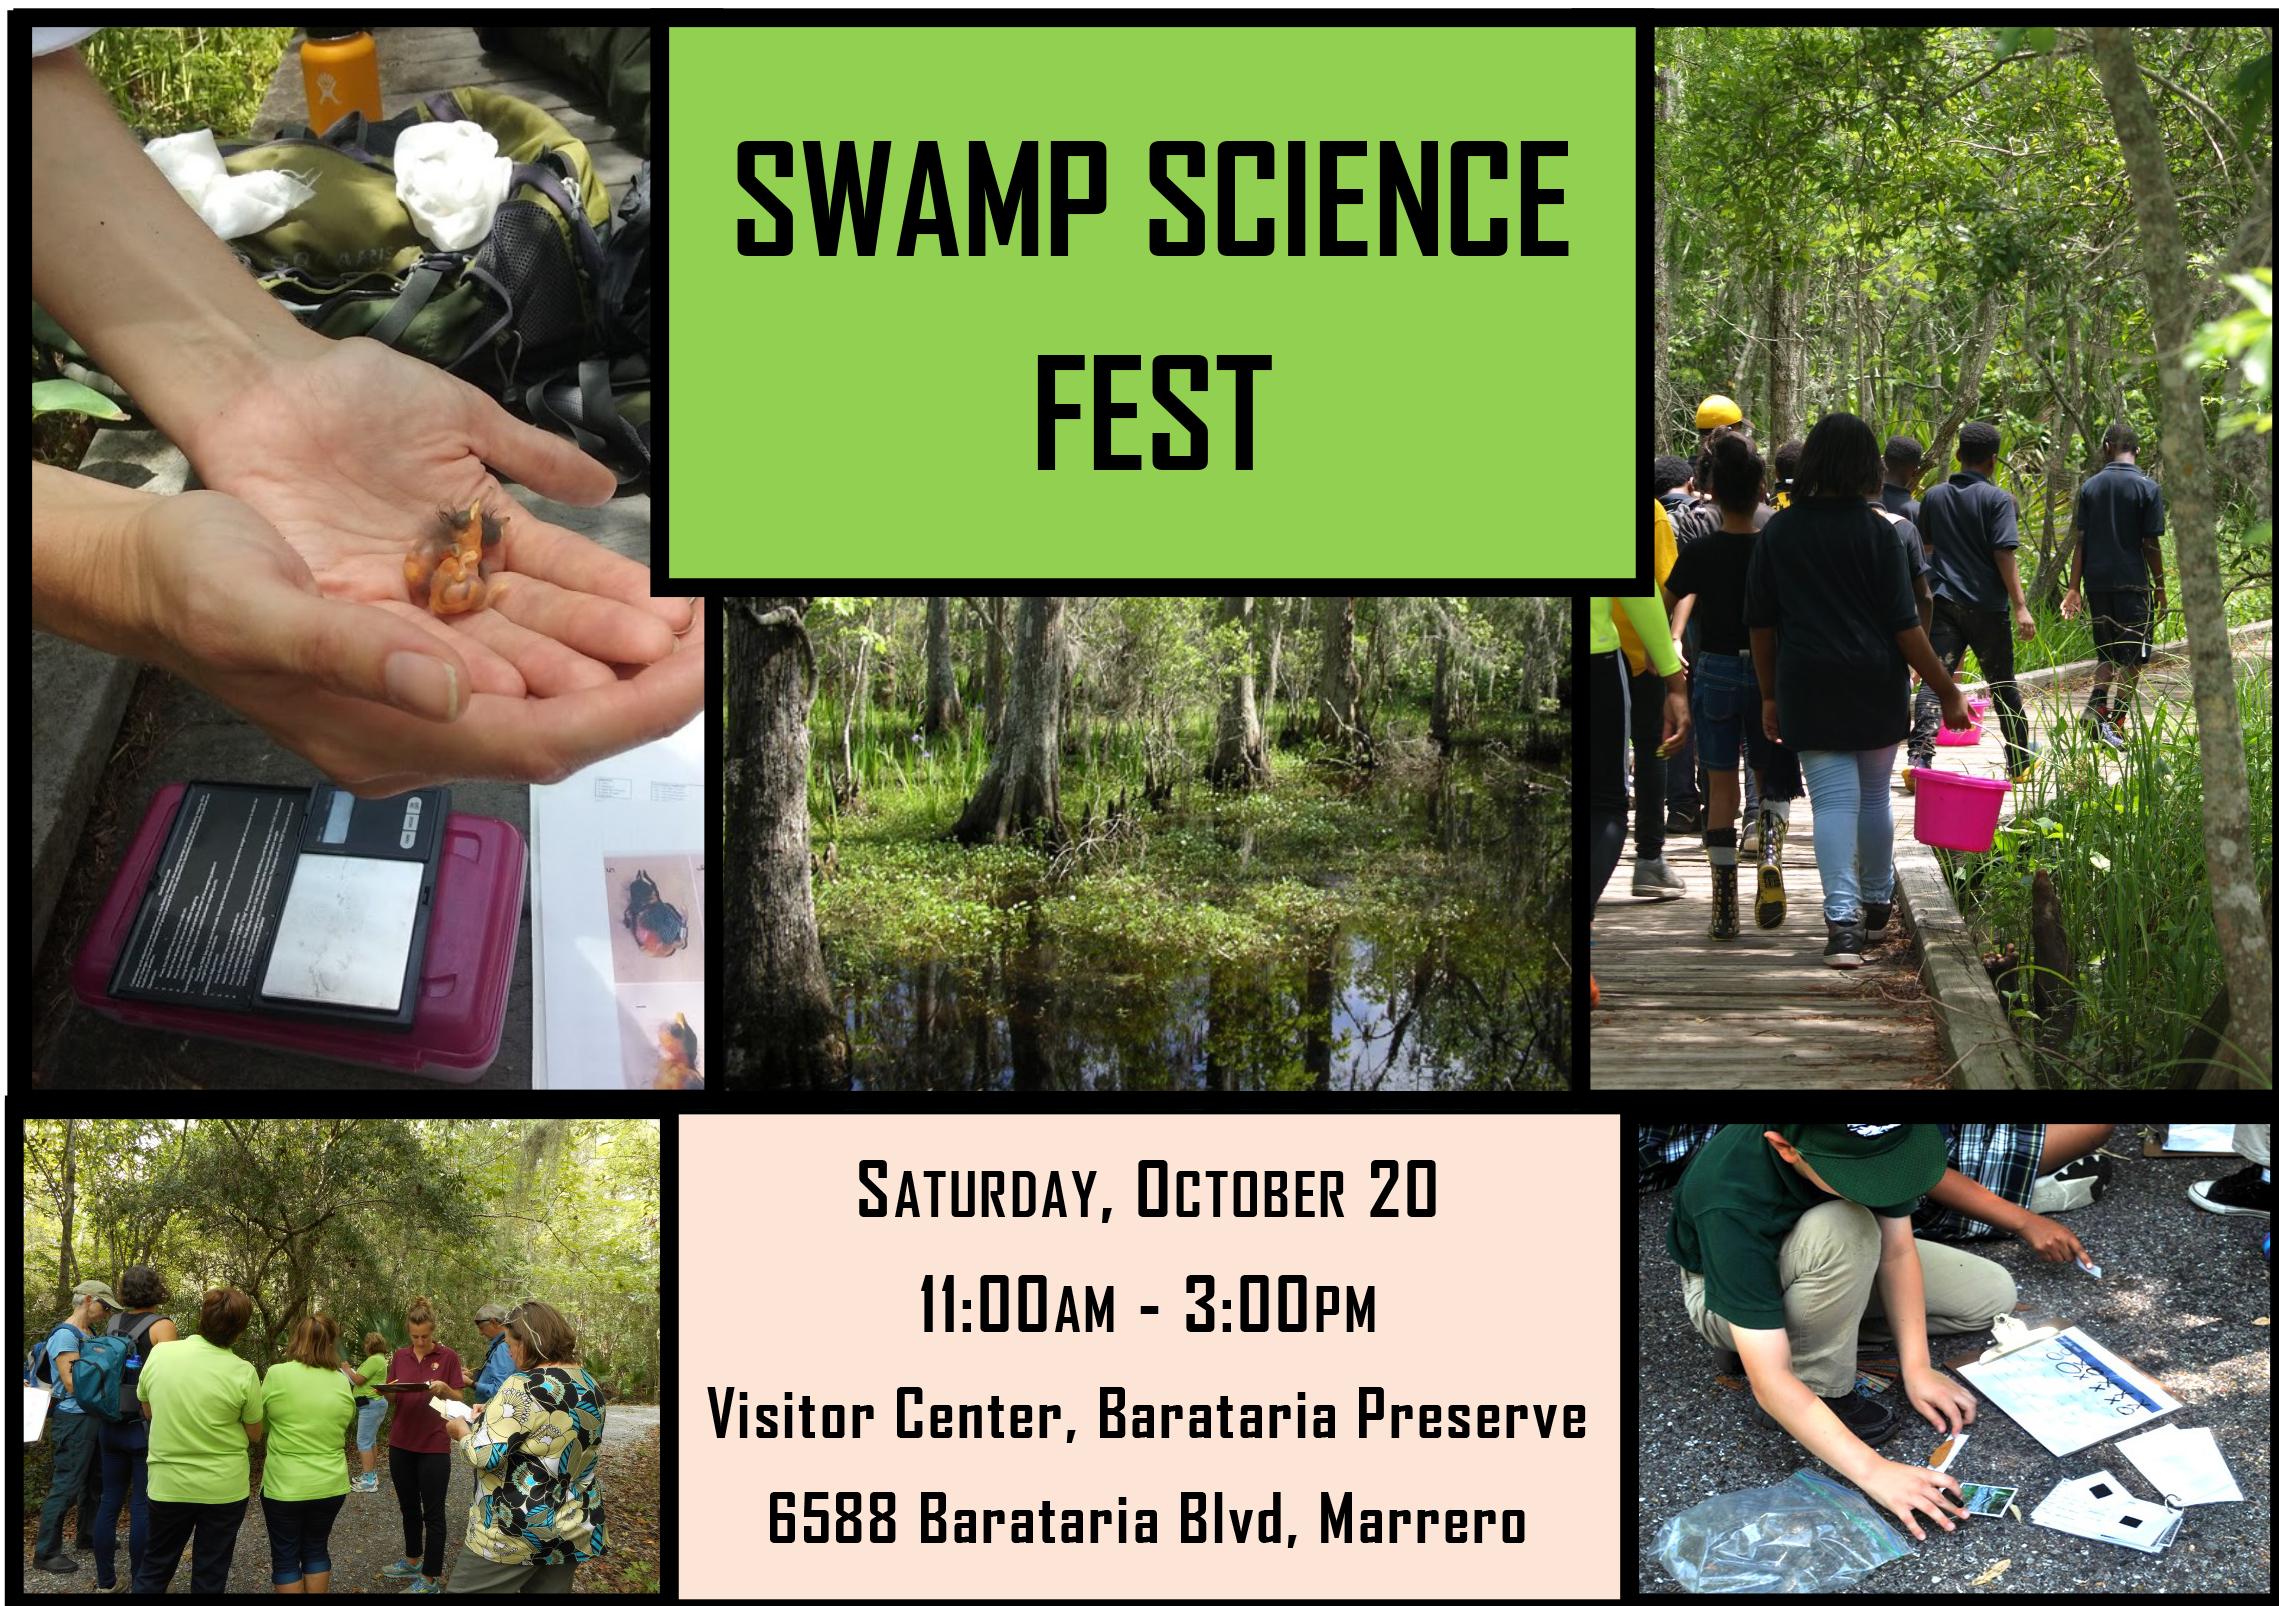 Swamp Science Fest